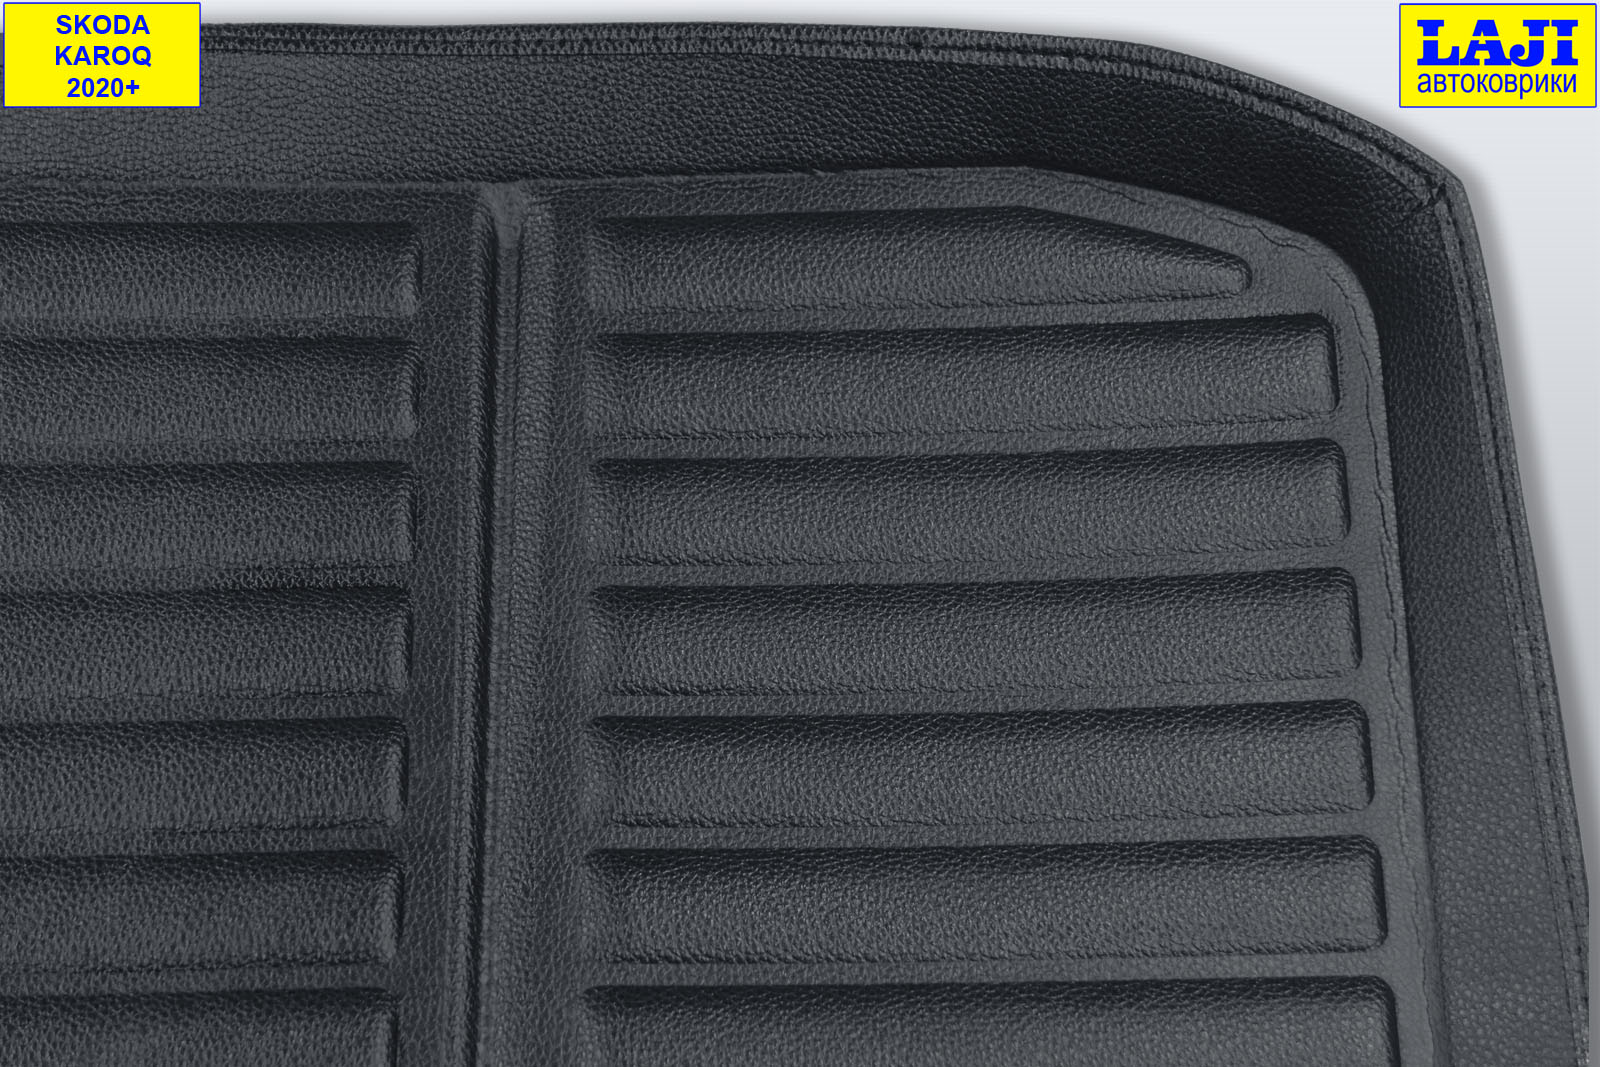 3D коврик в багажник Skoda Karoq 2020-н.в. 3